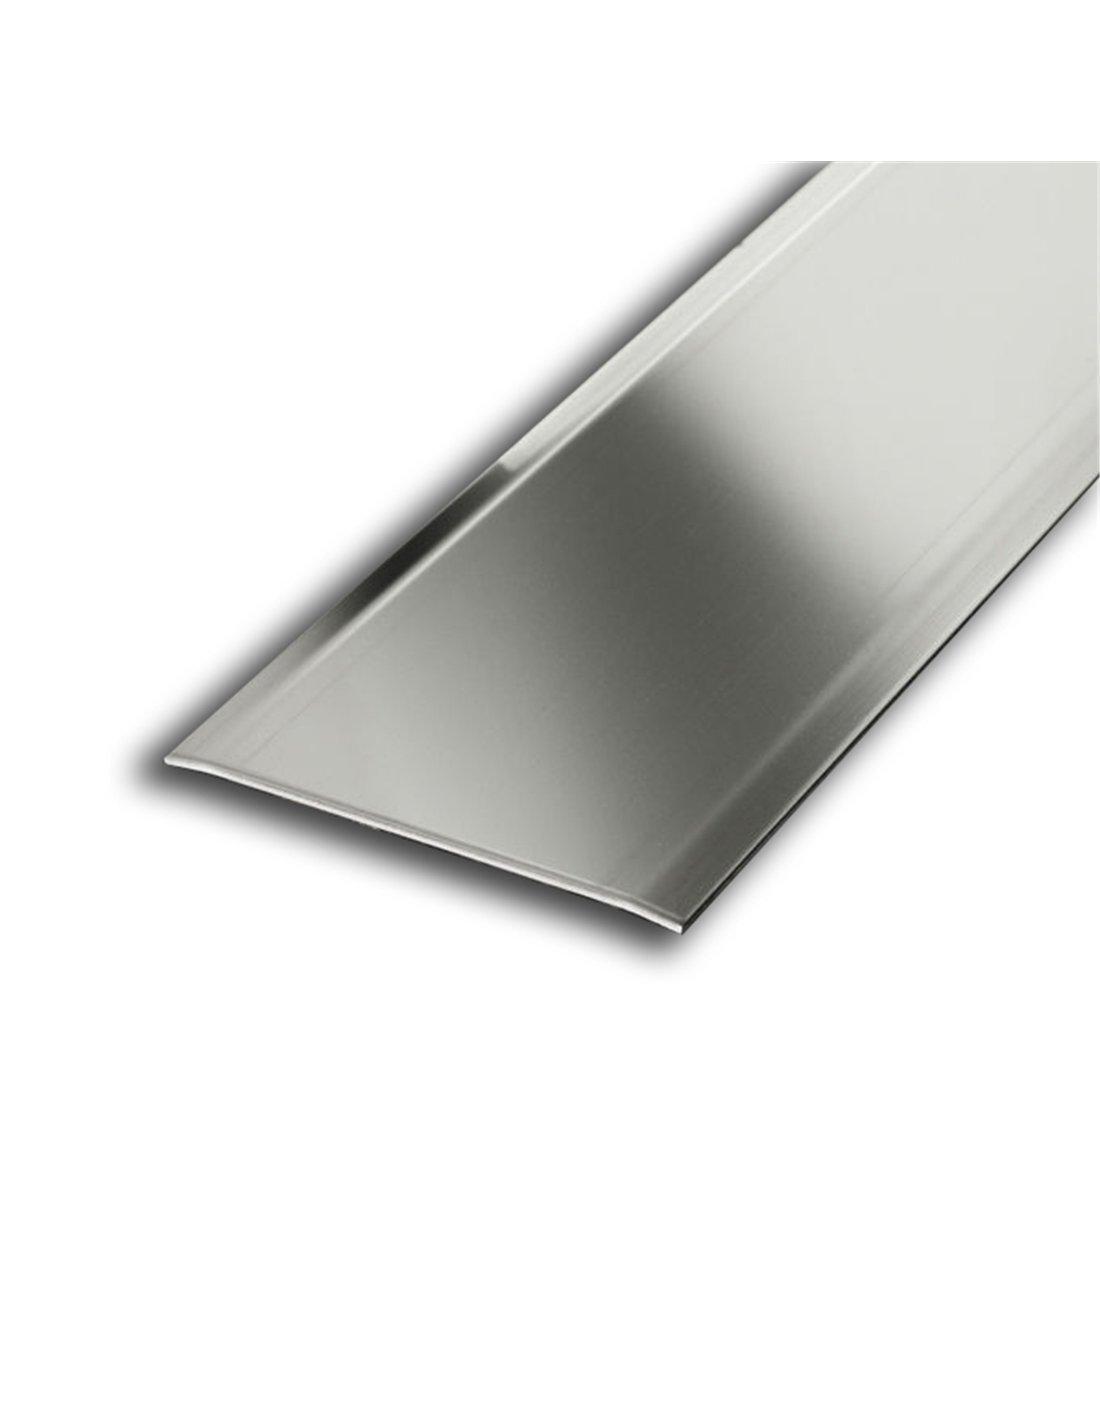 Jardin202 40mm anch. 3mm alt. 0, 83m larg. Adhesivo - Transicion Aluminio Dos Alas - 40mm